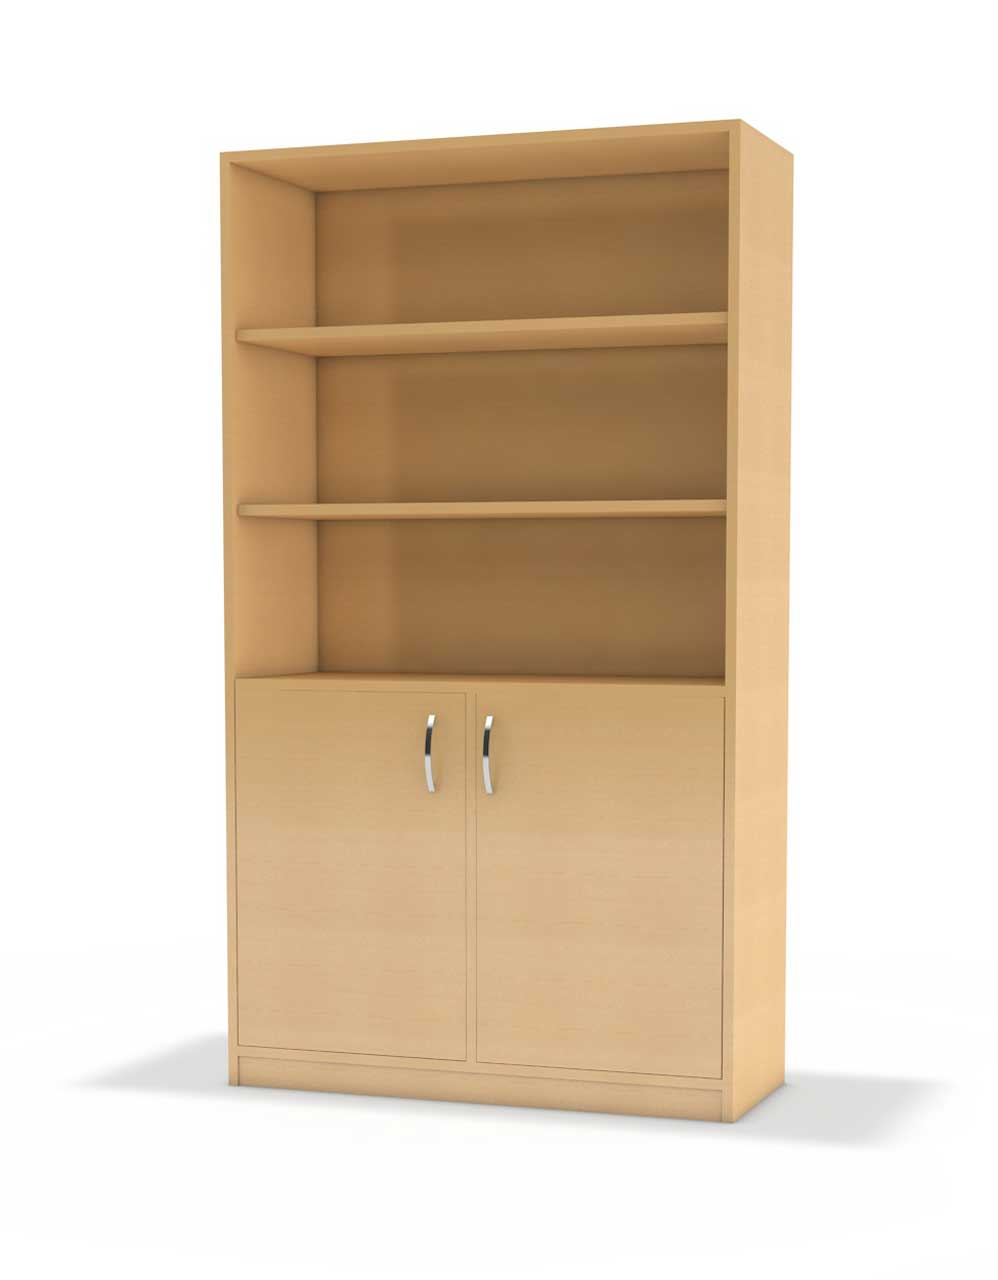 b ro hochschrank serie b nova unten 2 t ren oben regal kita. Black Bedroom Furniture Sets. Home Design Ideas